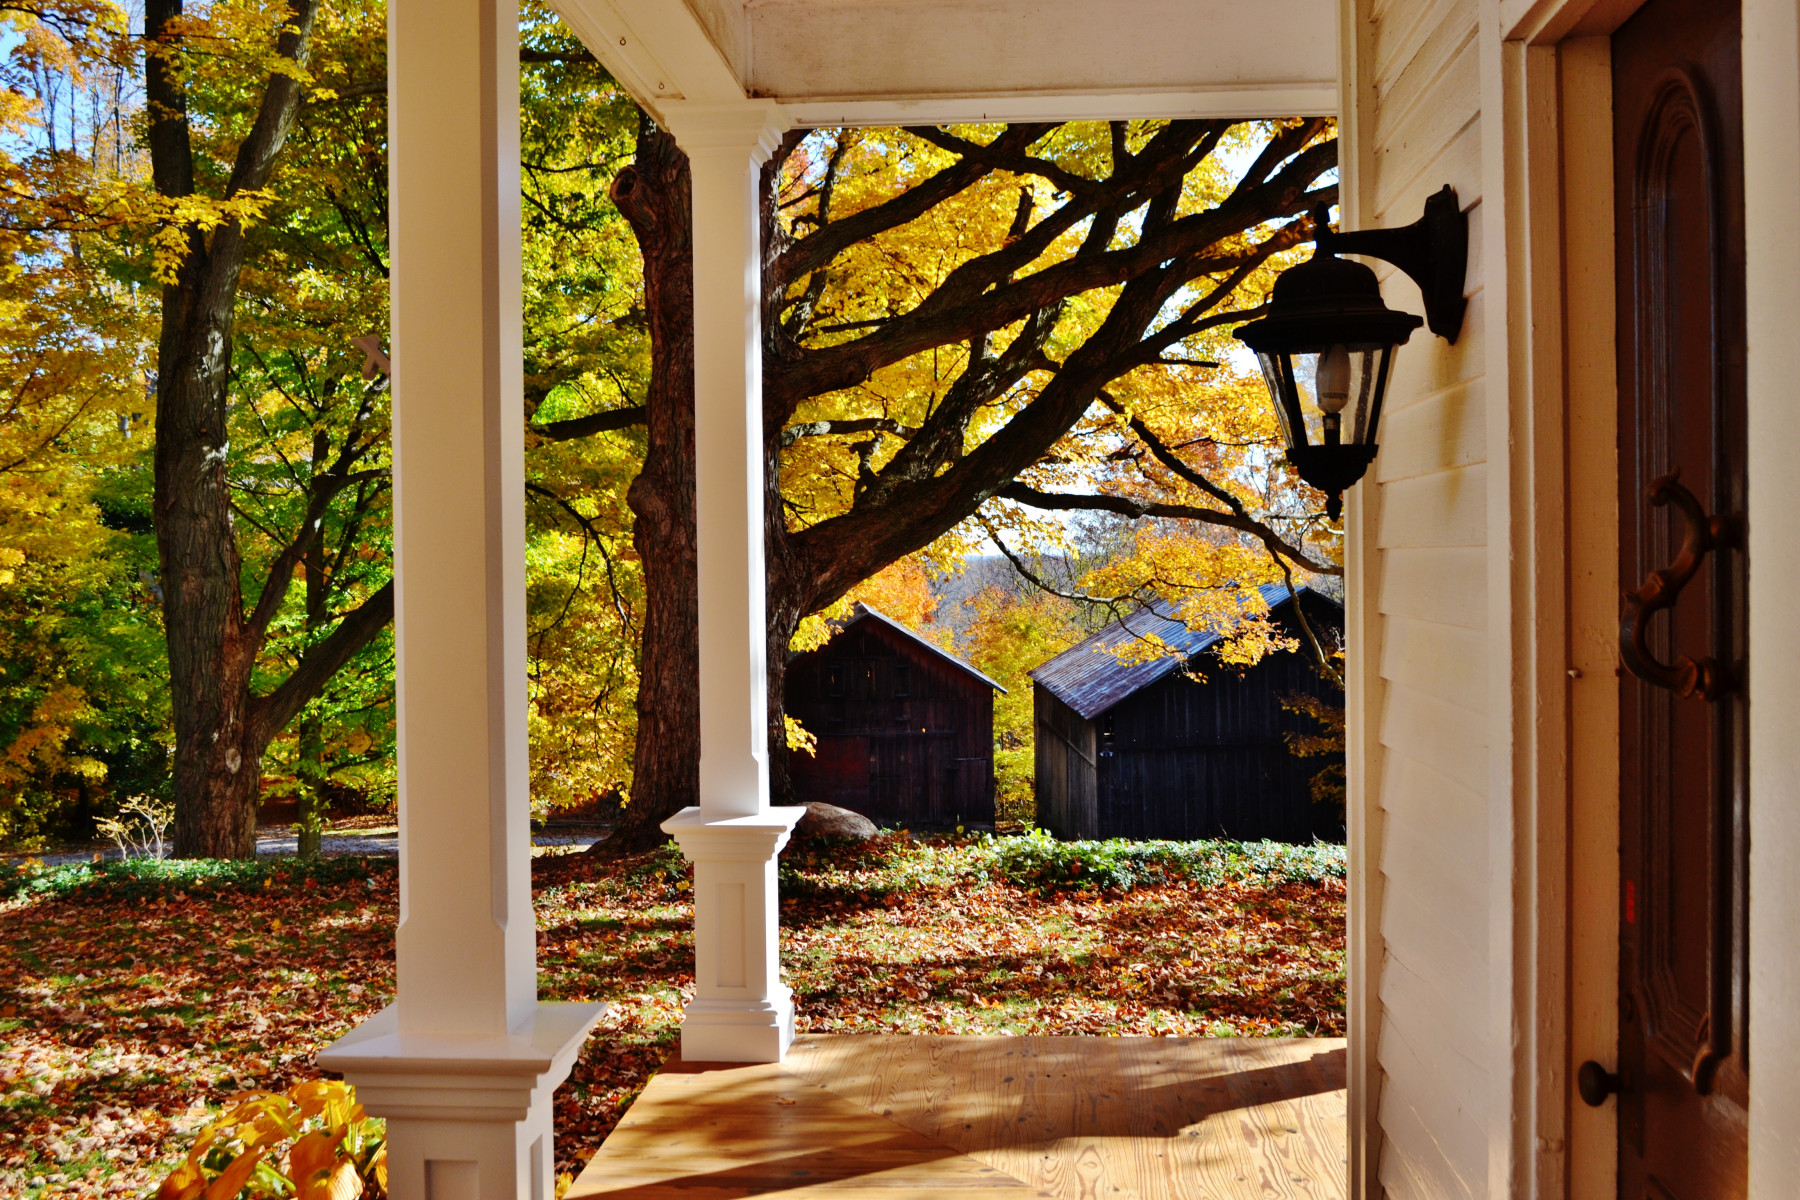 porch lighting - Tim Kyle